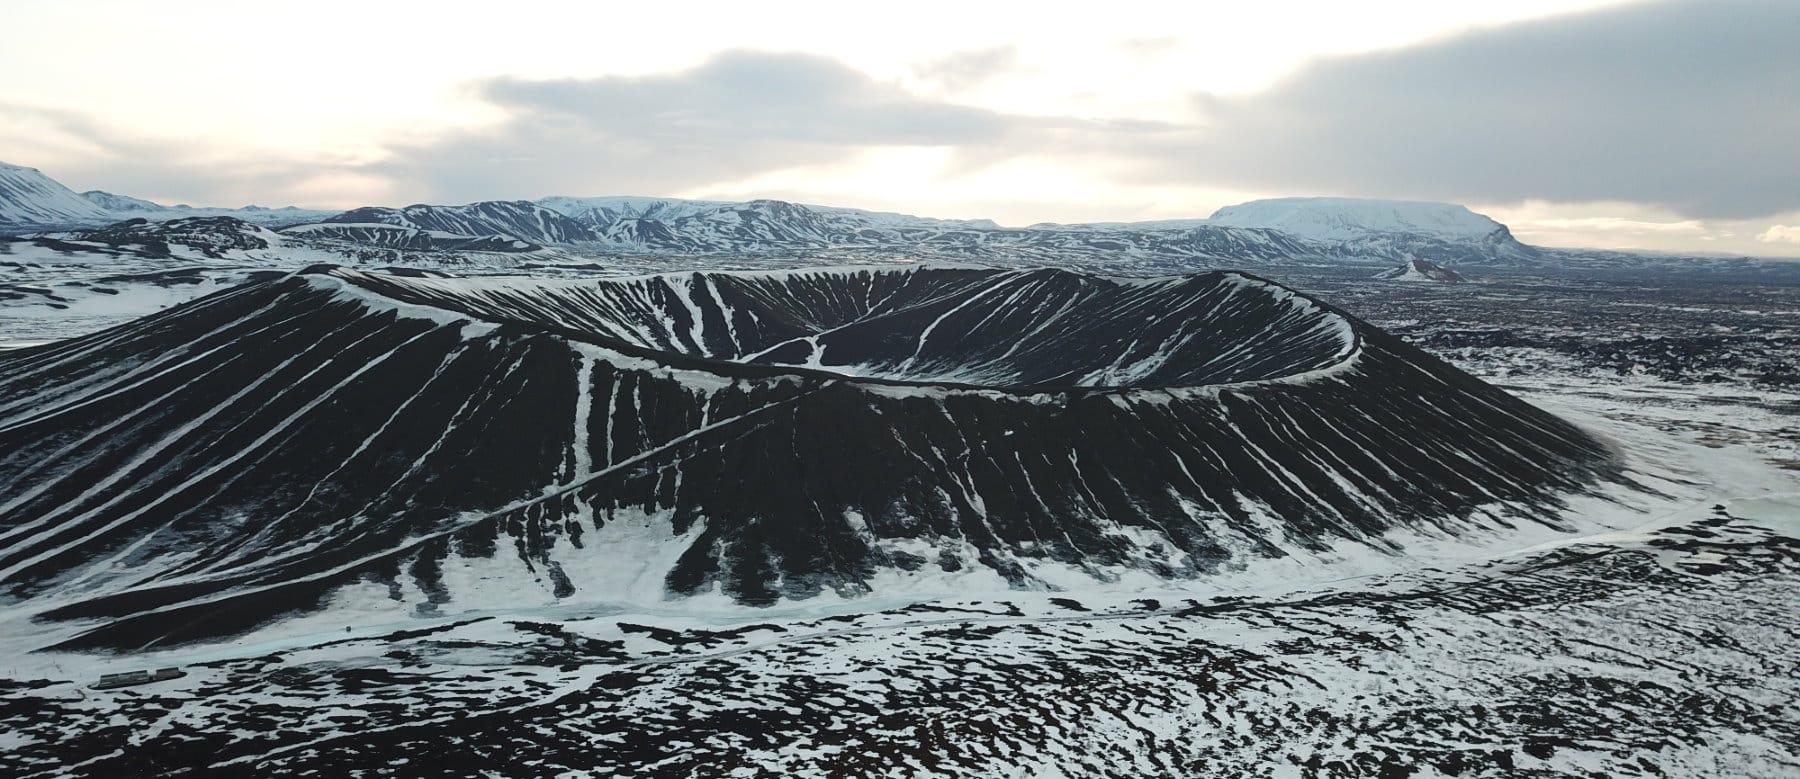 Hverfjall dans le nord de l'Islande